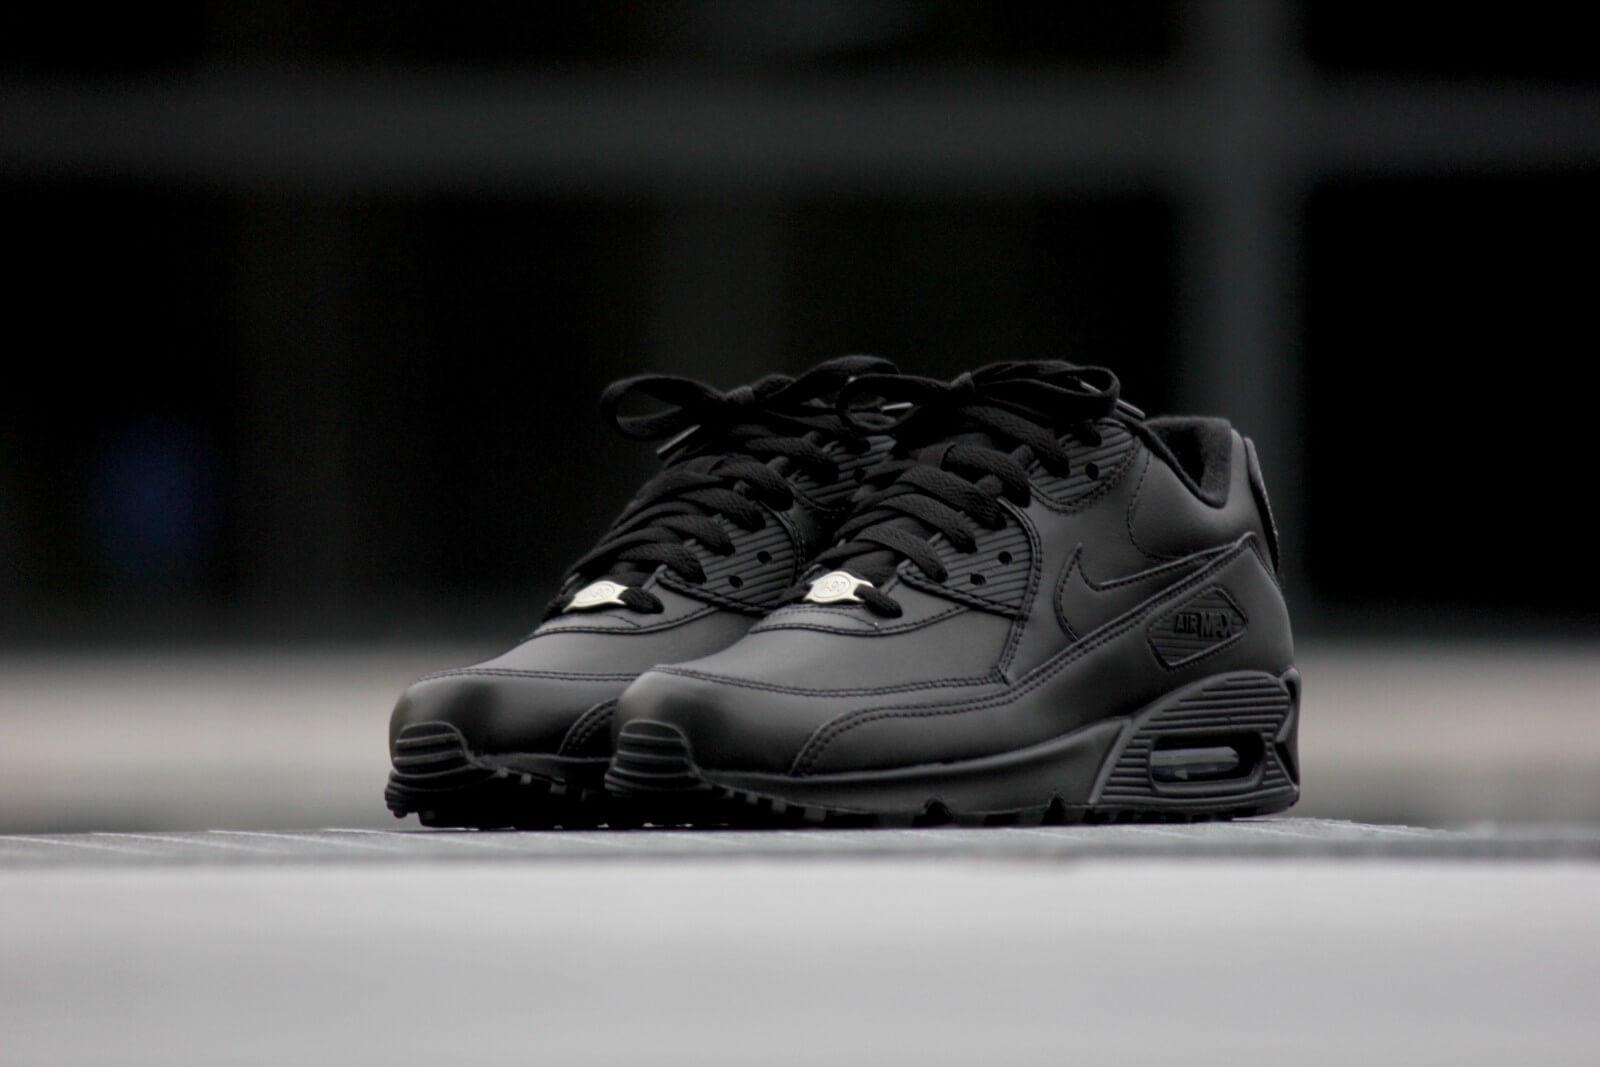 nike air max 90 leather noire et kaki